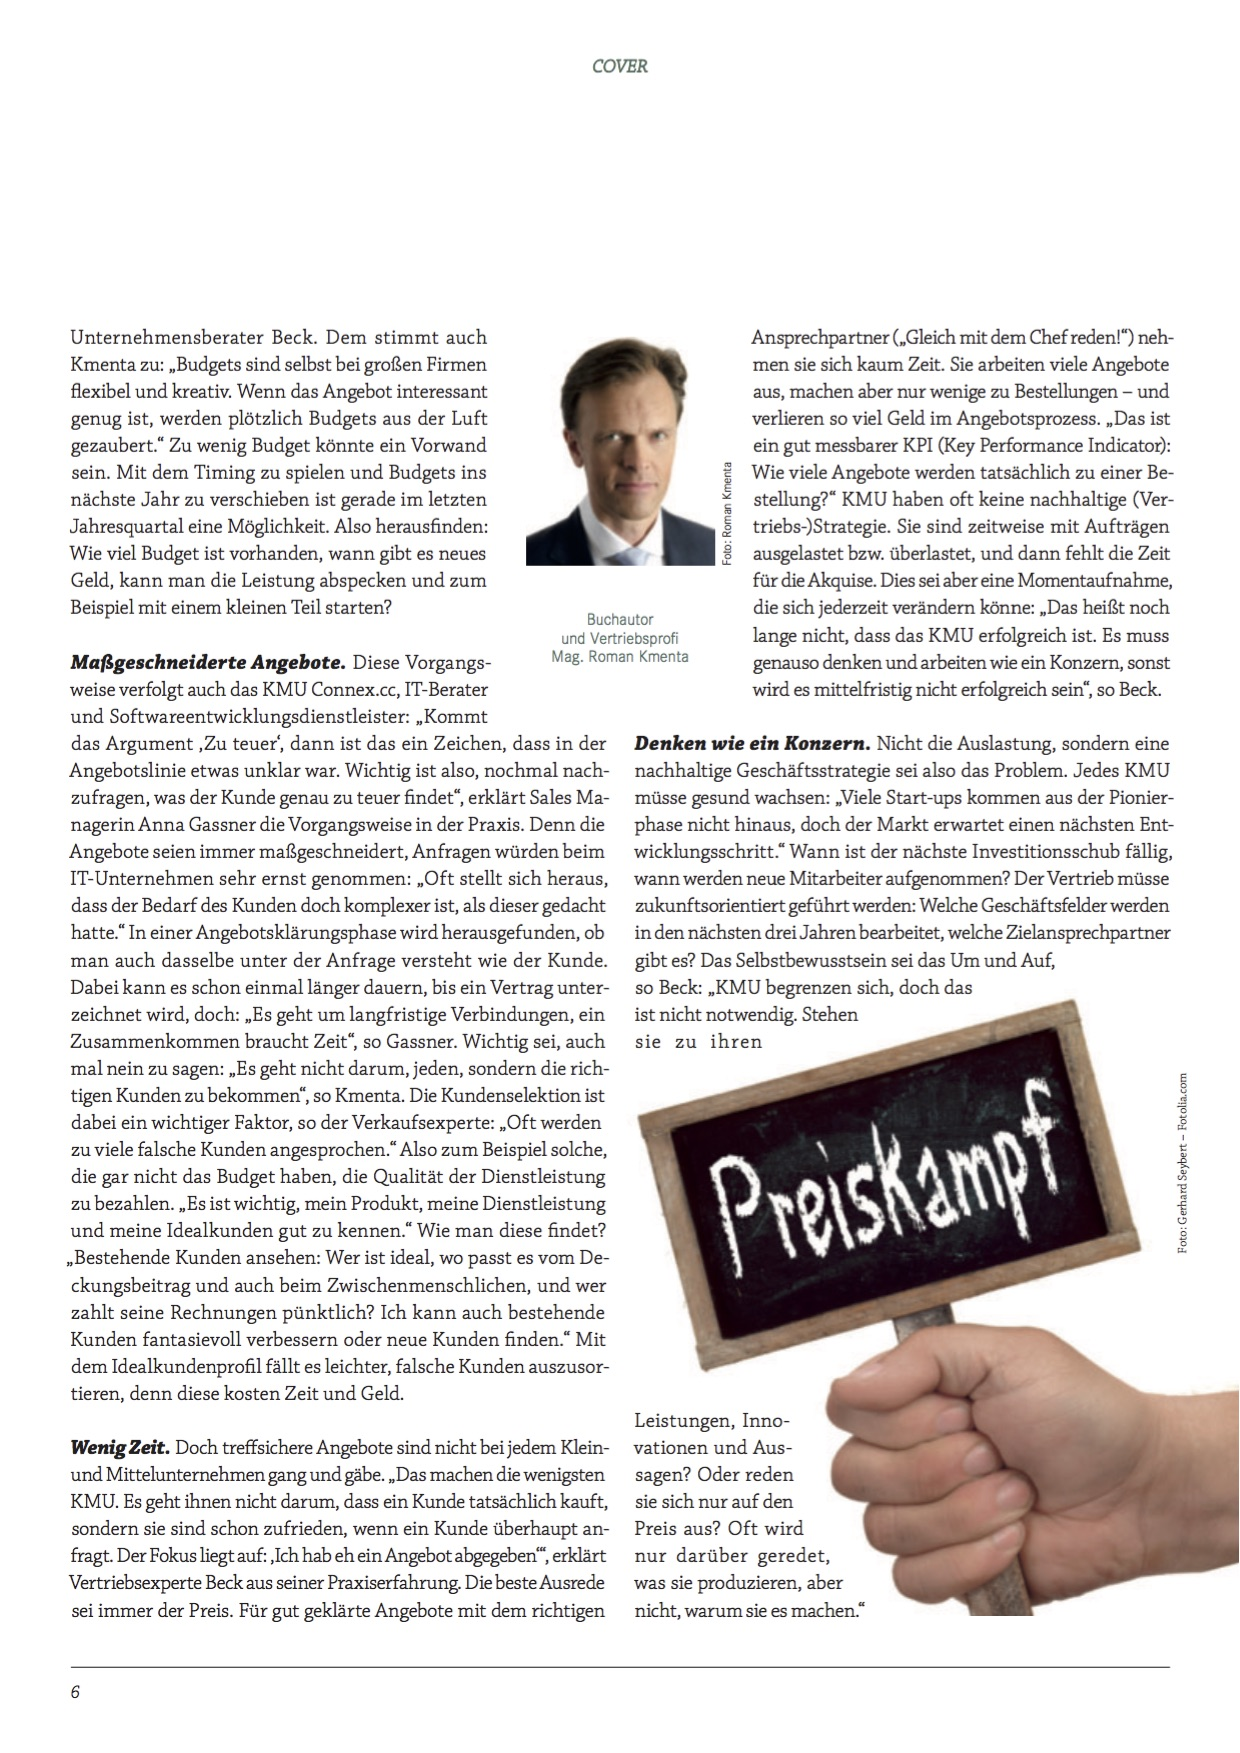 Preiskampf - forum.ksv05-2015 - 3 - Kmenta - Autor und Keynote Speaker